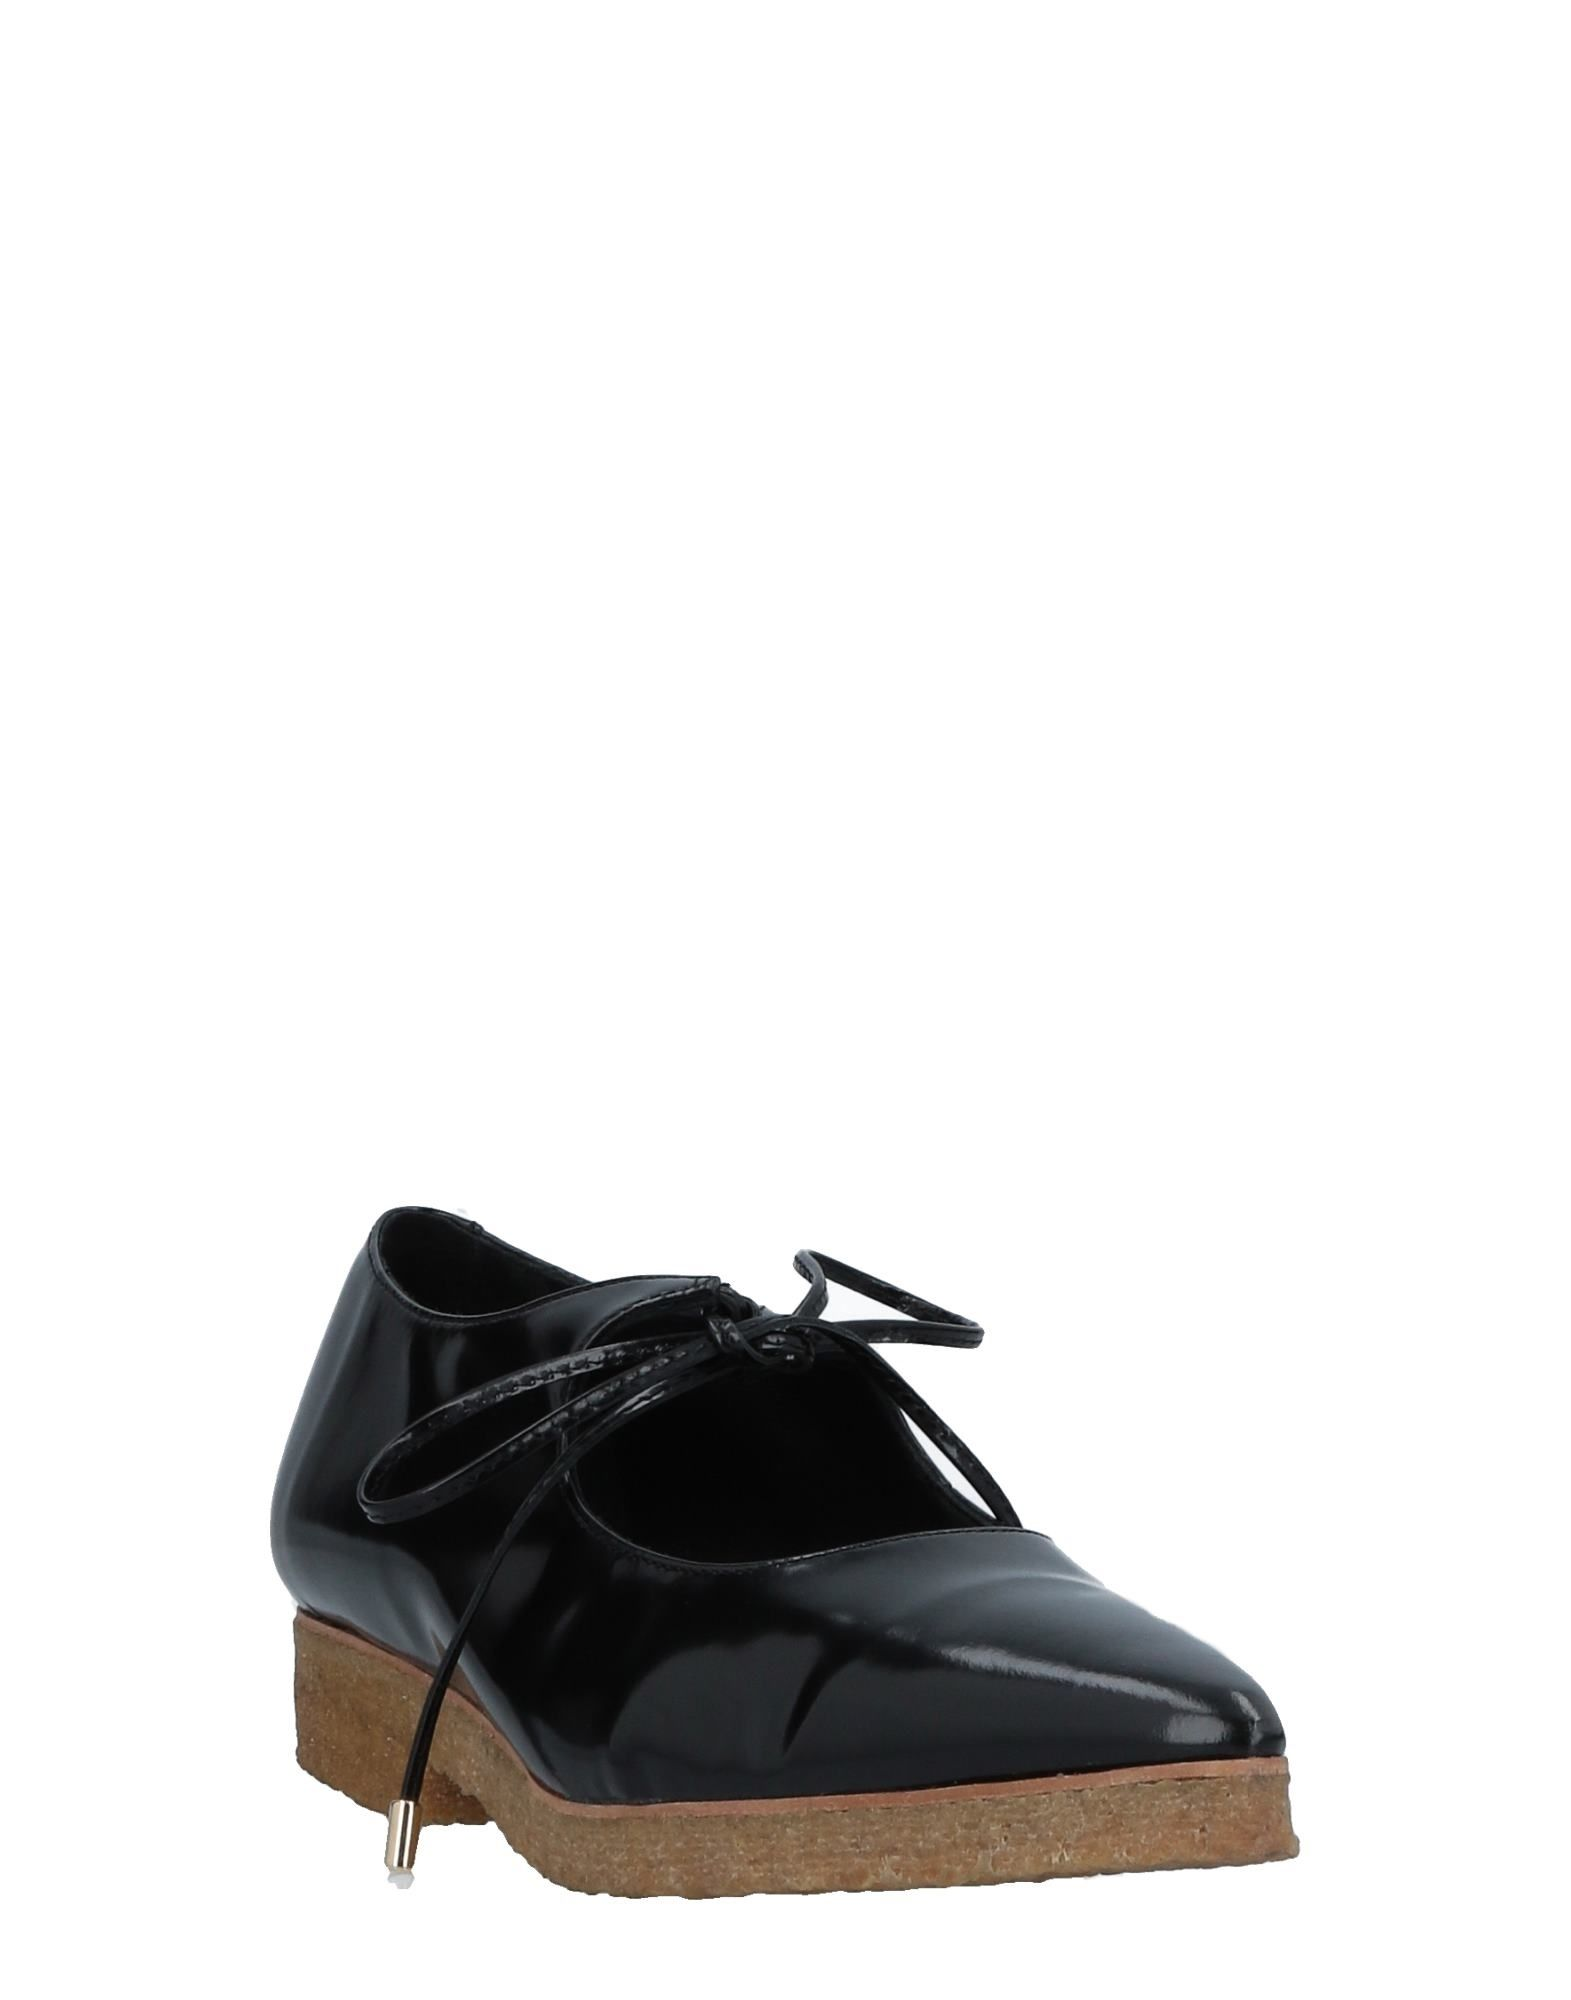 Gut um billige Damen Schuhe zu tragenPaloma Barceló Stiefelette Damen billige  11512950PP ad1a3a